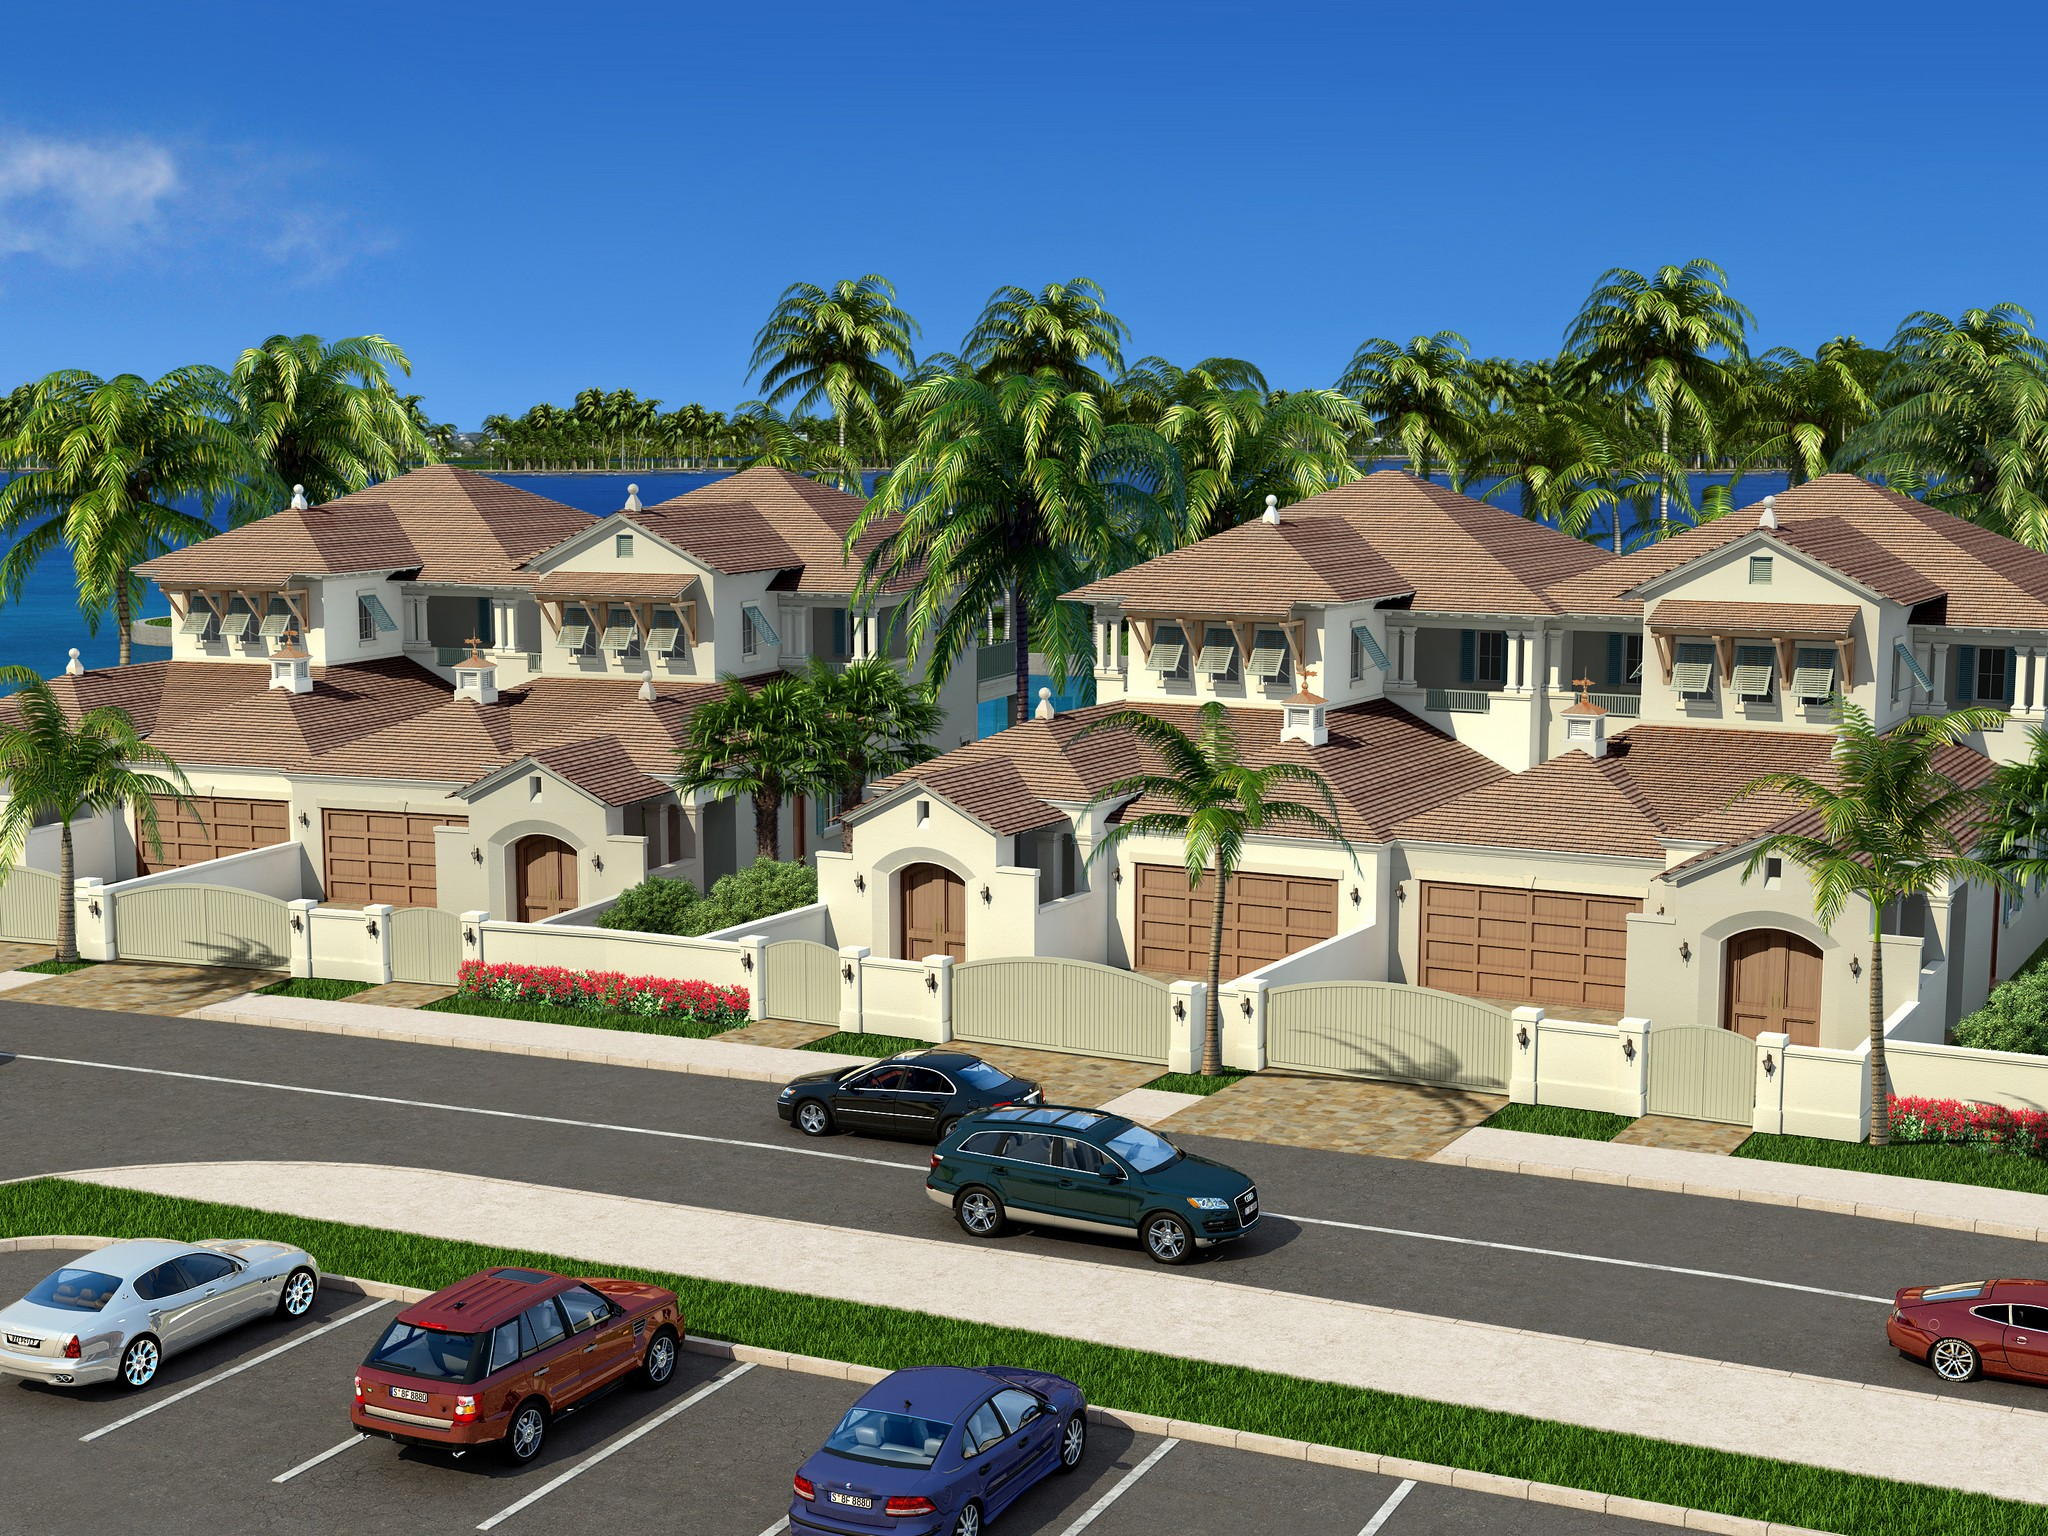 Villetta a schiera per Vendita alle ore Luxurious Riverfront Townhome on Royal Palm Pointe 21 Royal Palm Pointe #4 Vero Beach, Florida 32960 Stati Uniti